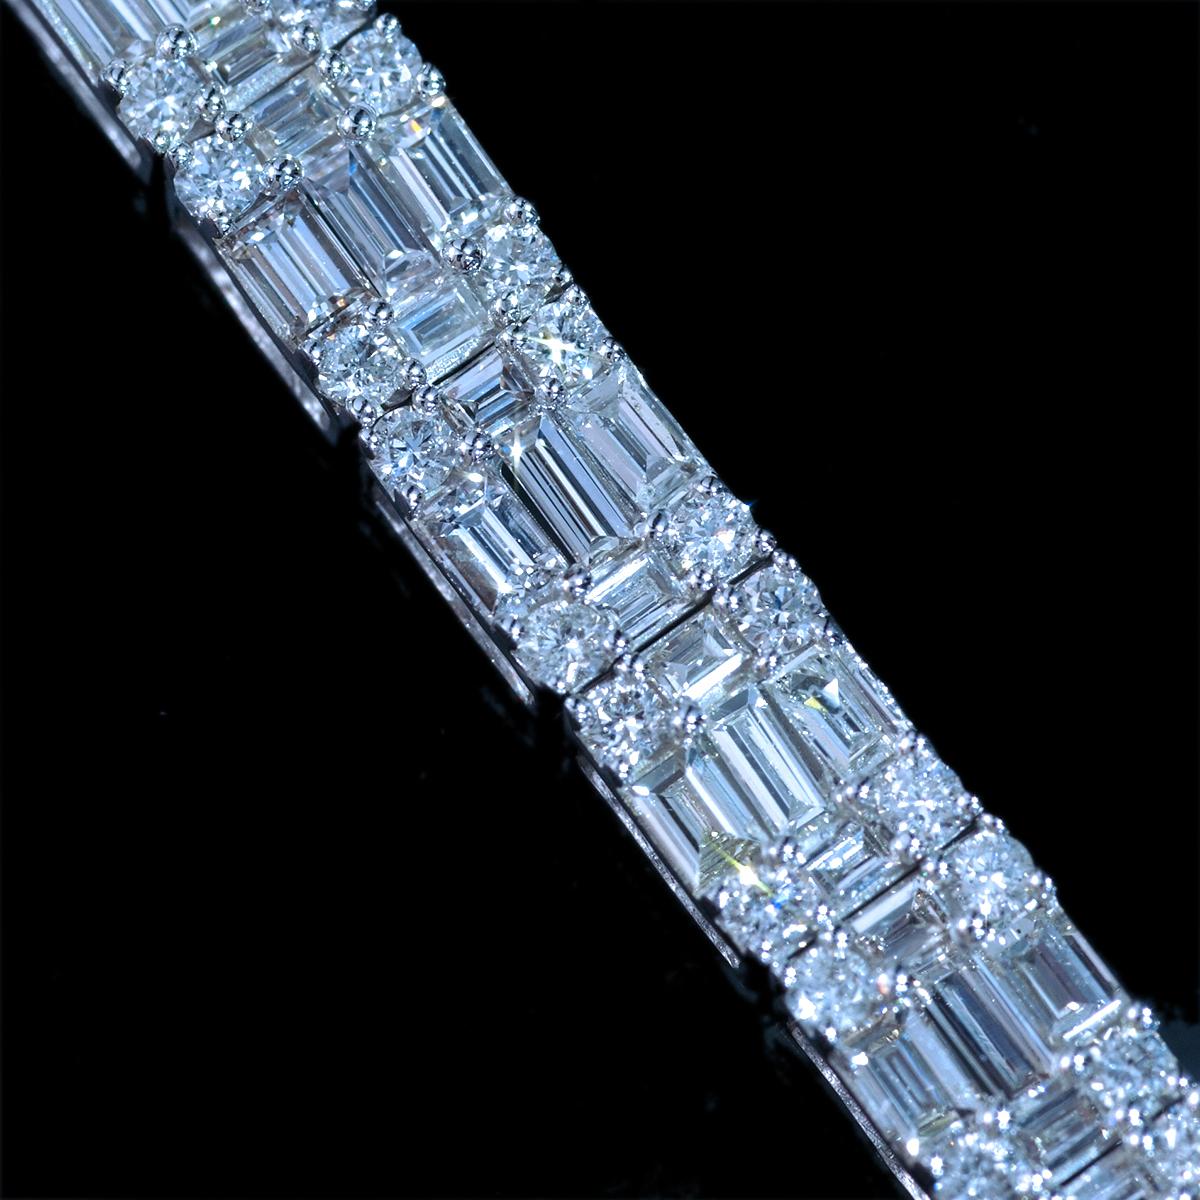 *BL2527 新品!業者向け令和新作! 天然上質ダイヤモンド5.00ct 最高級18金WG無垢セレブリティブレスレット